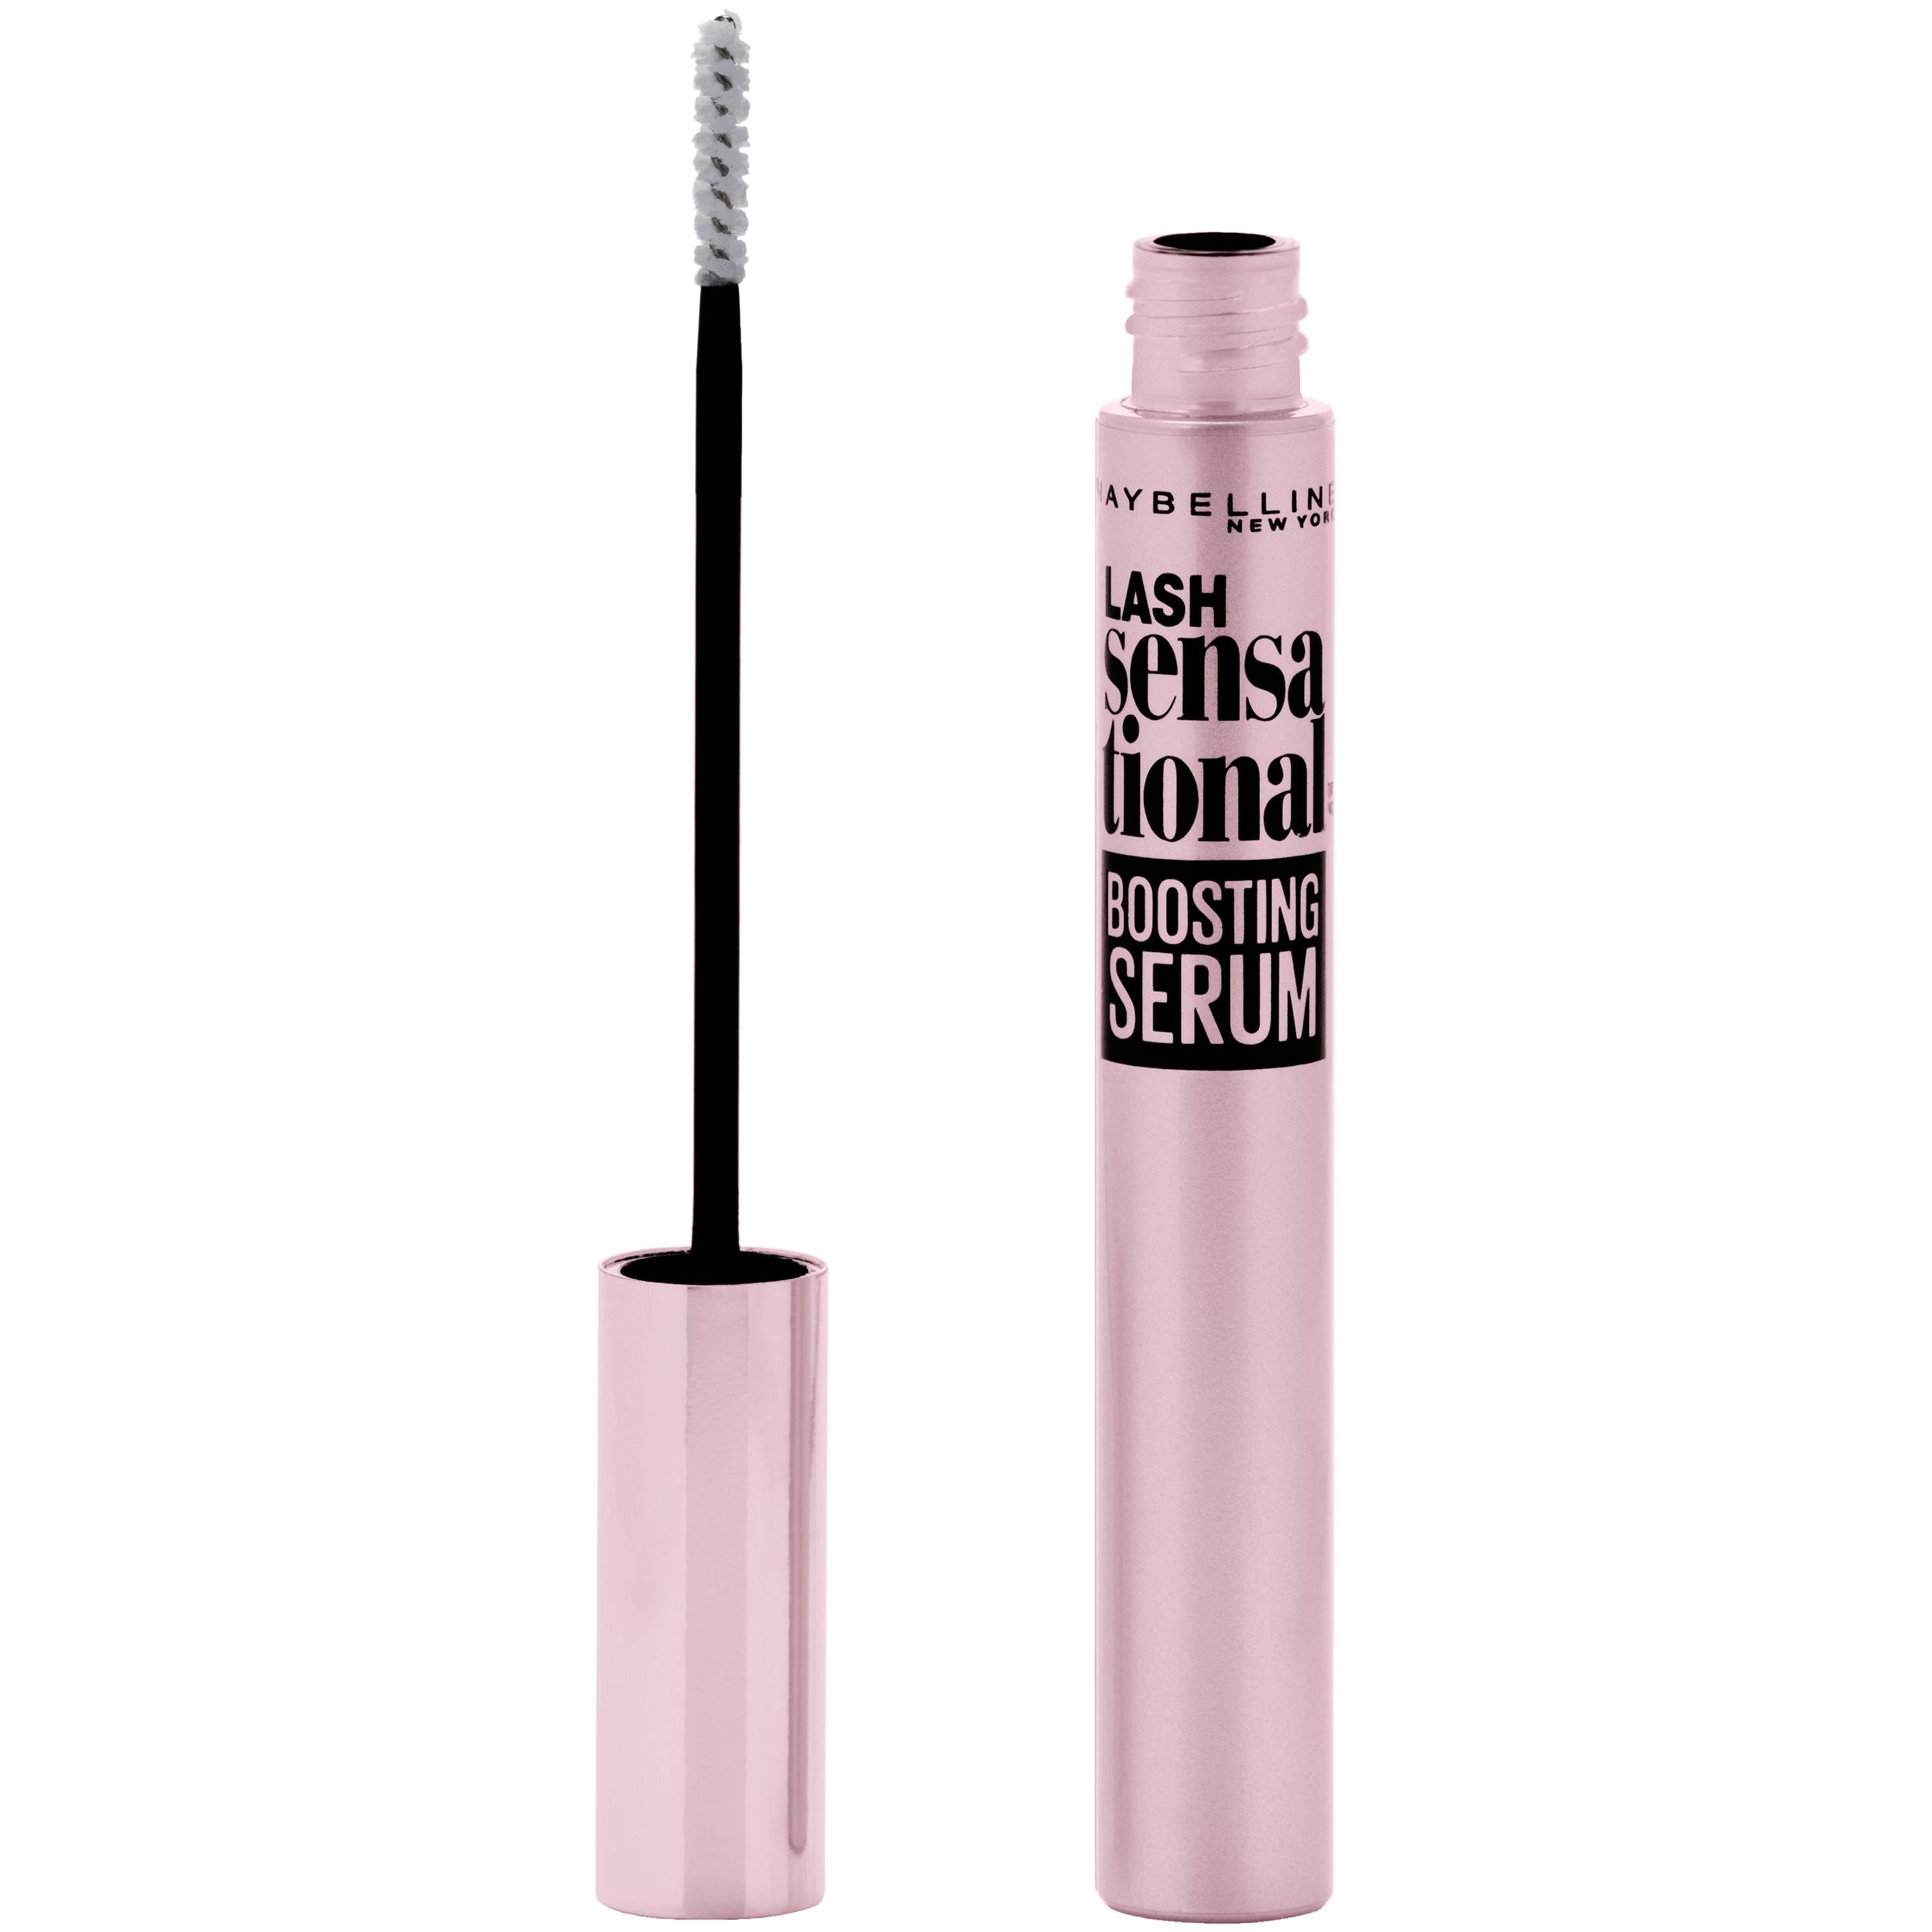 f87d9b02c17 Maybelline Lash Sensational Boosting Eyelash Serum, Boosting Serum -  Walmart.com